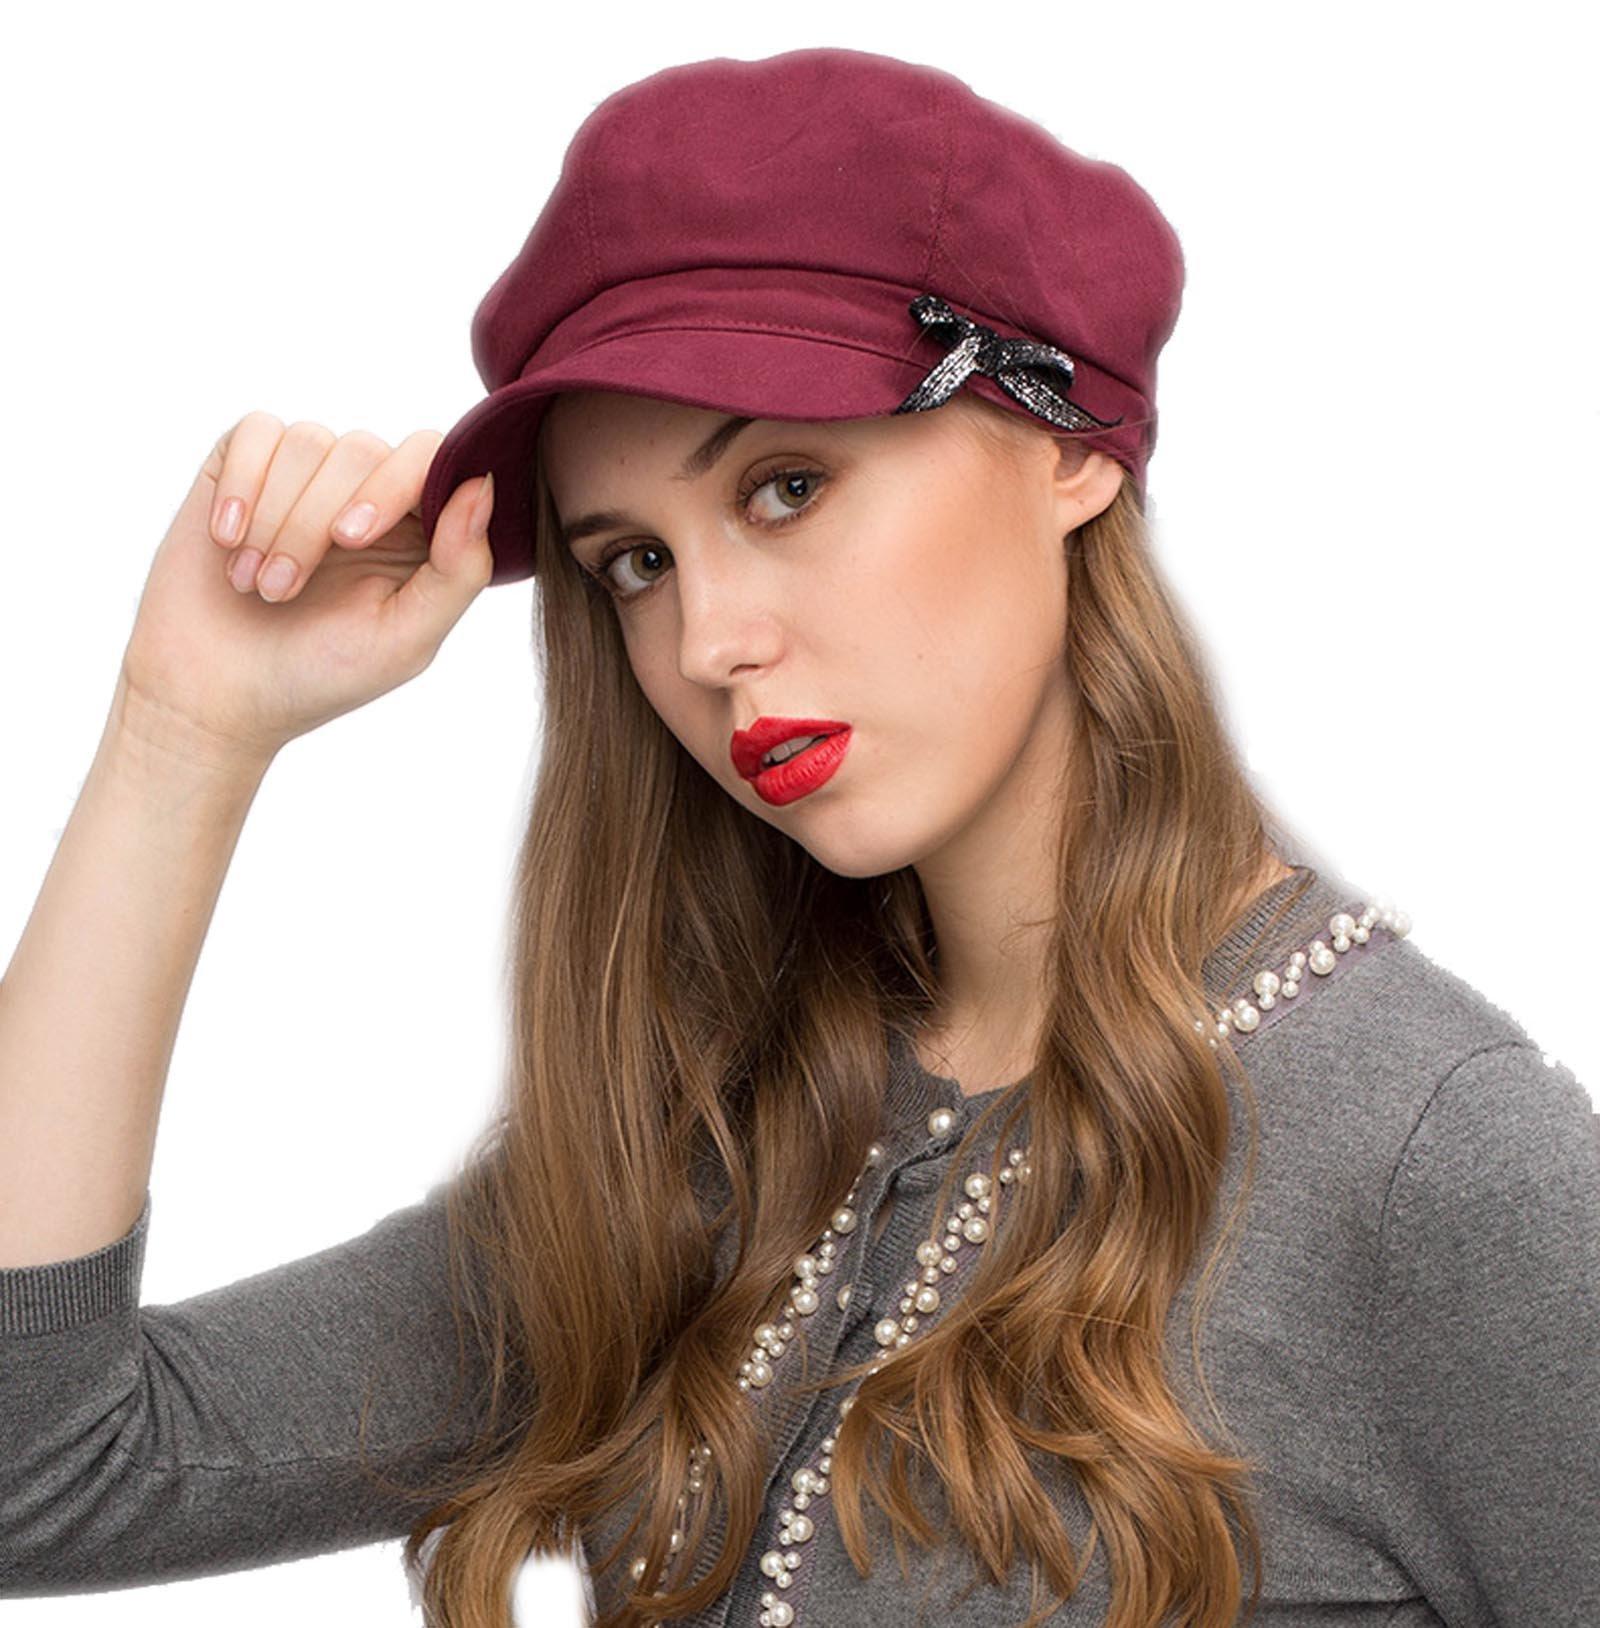 Stand Focus Women Ladies Cotton Newsboy Cabbie Gatsby Hat Cap Glitter Ribbon Navy Burgundy Khaki